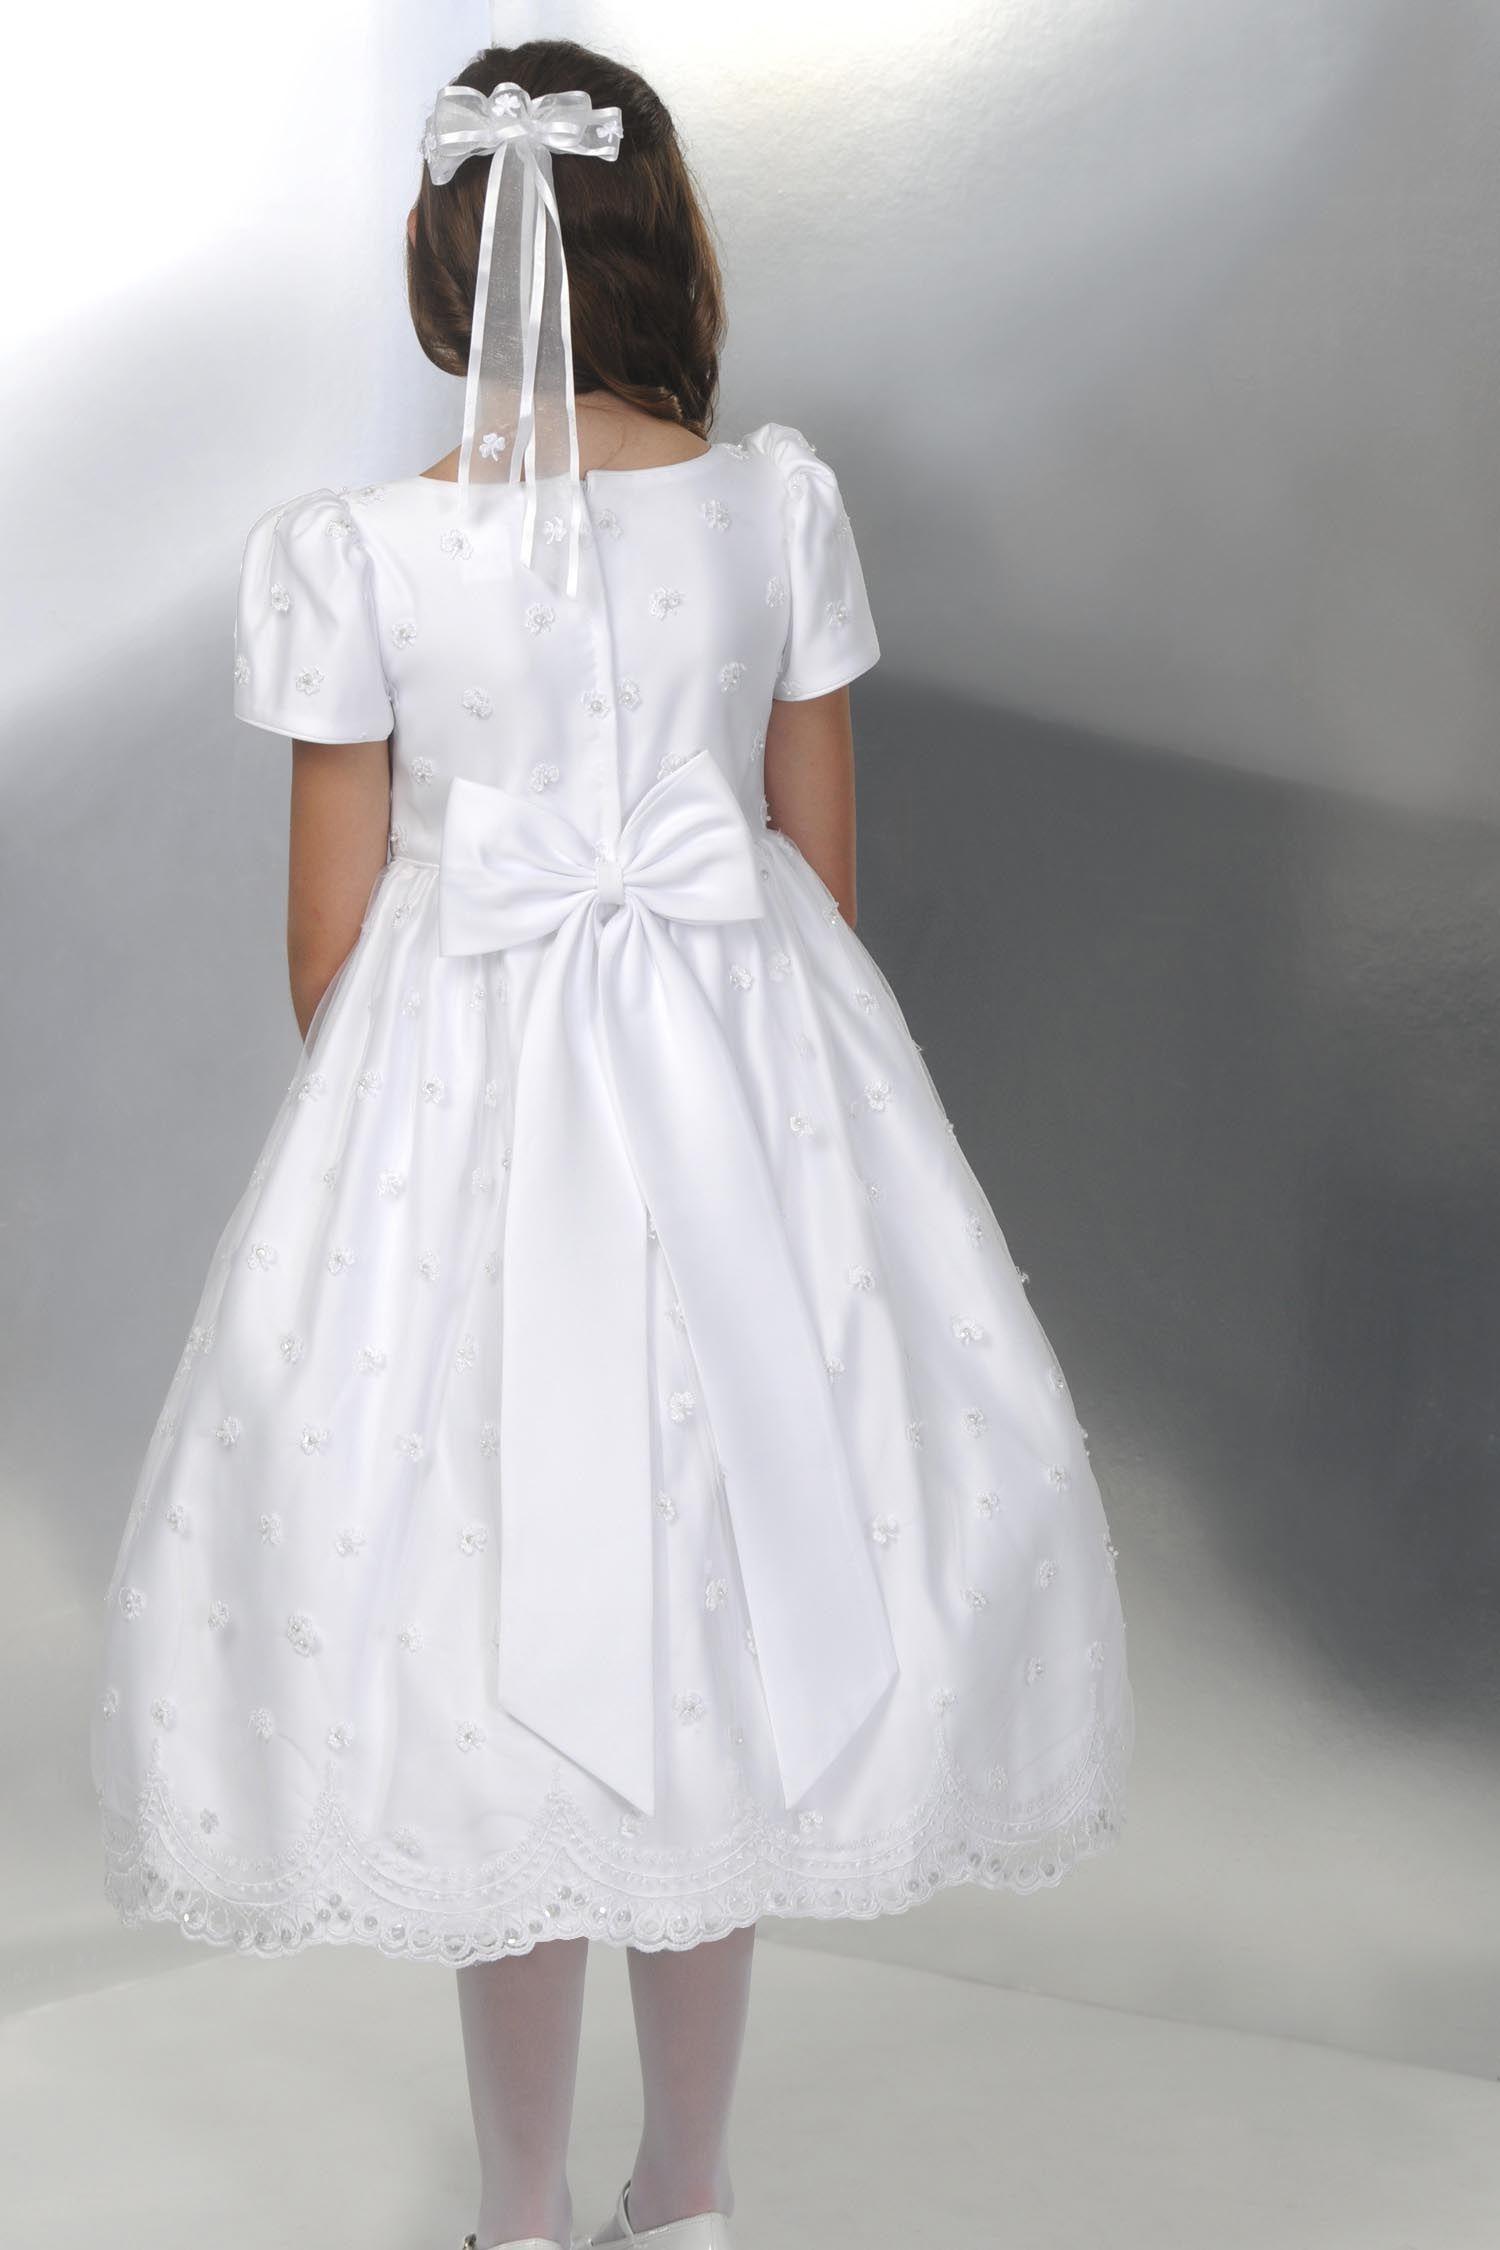 Image detail for communion dress d4199 irish shamrock